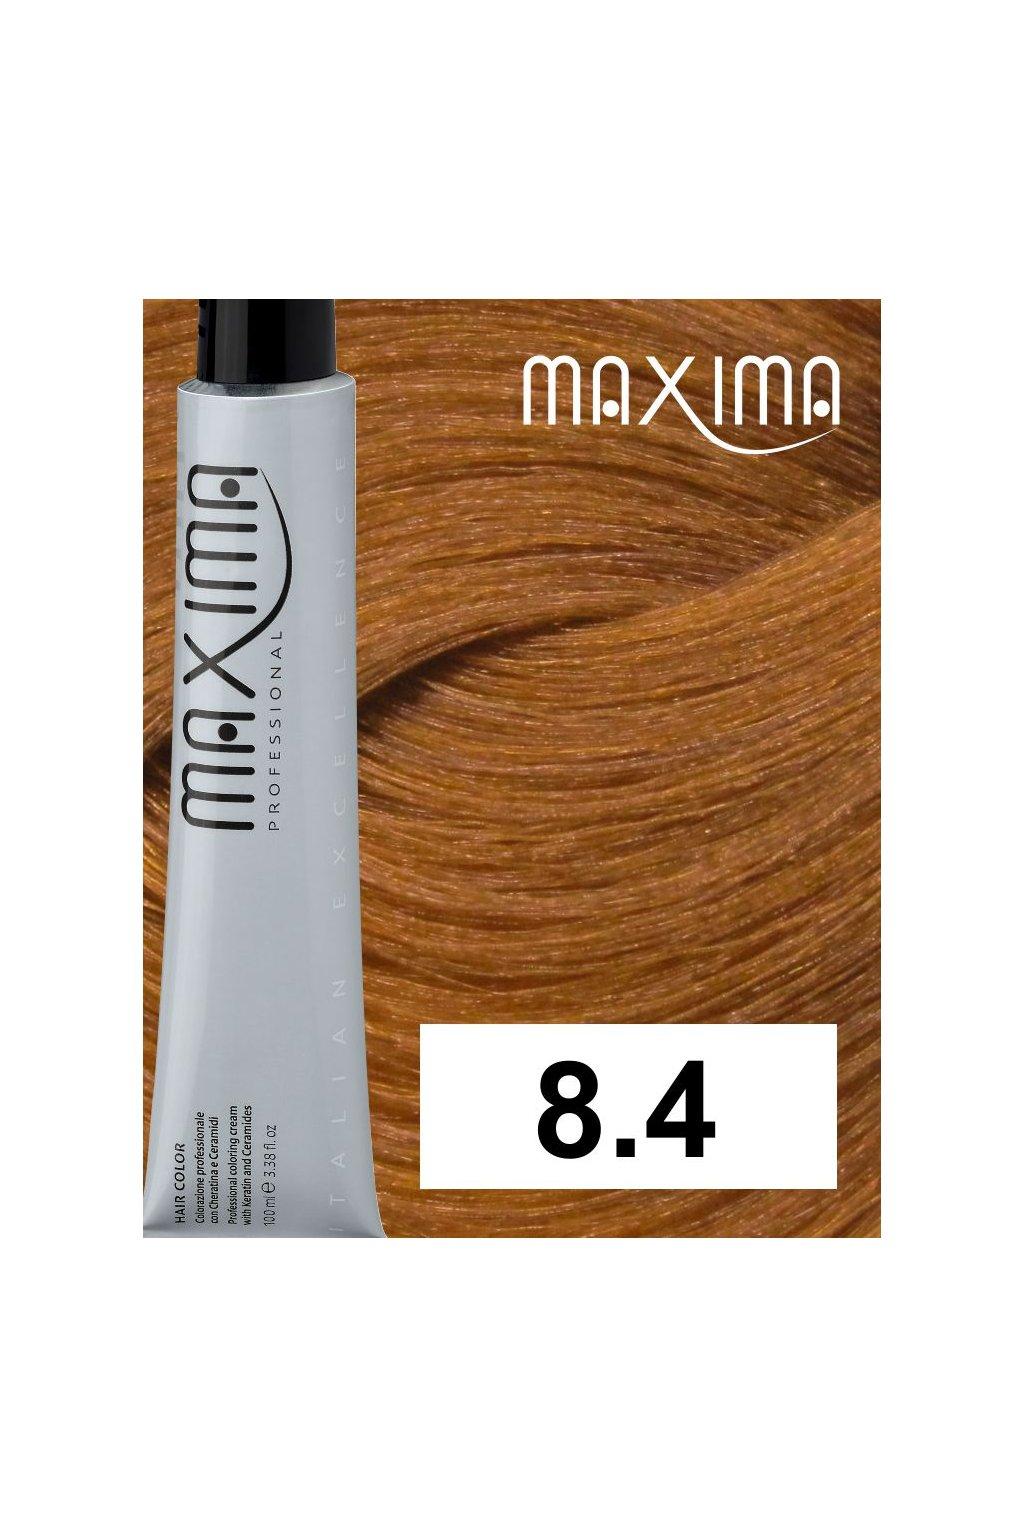 8 4 max